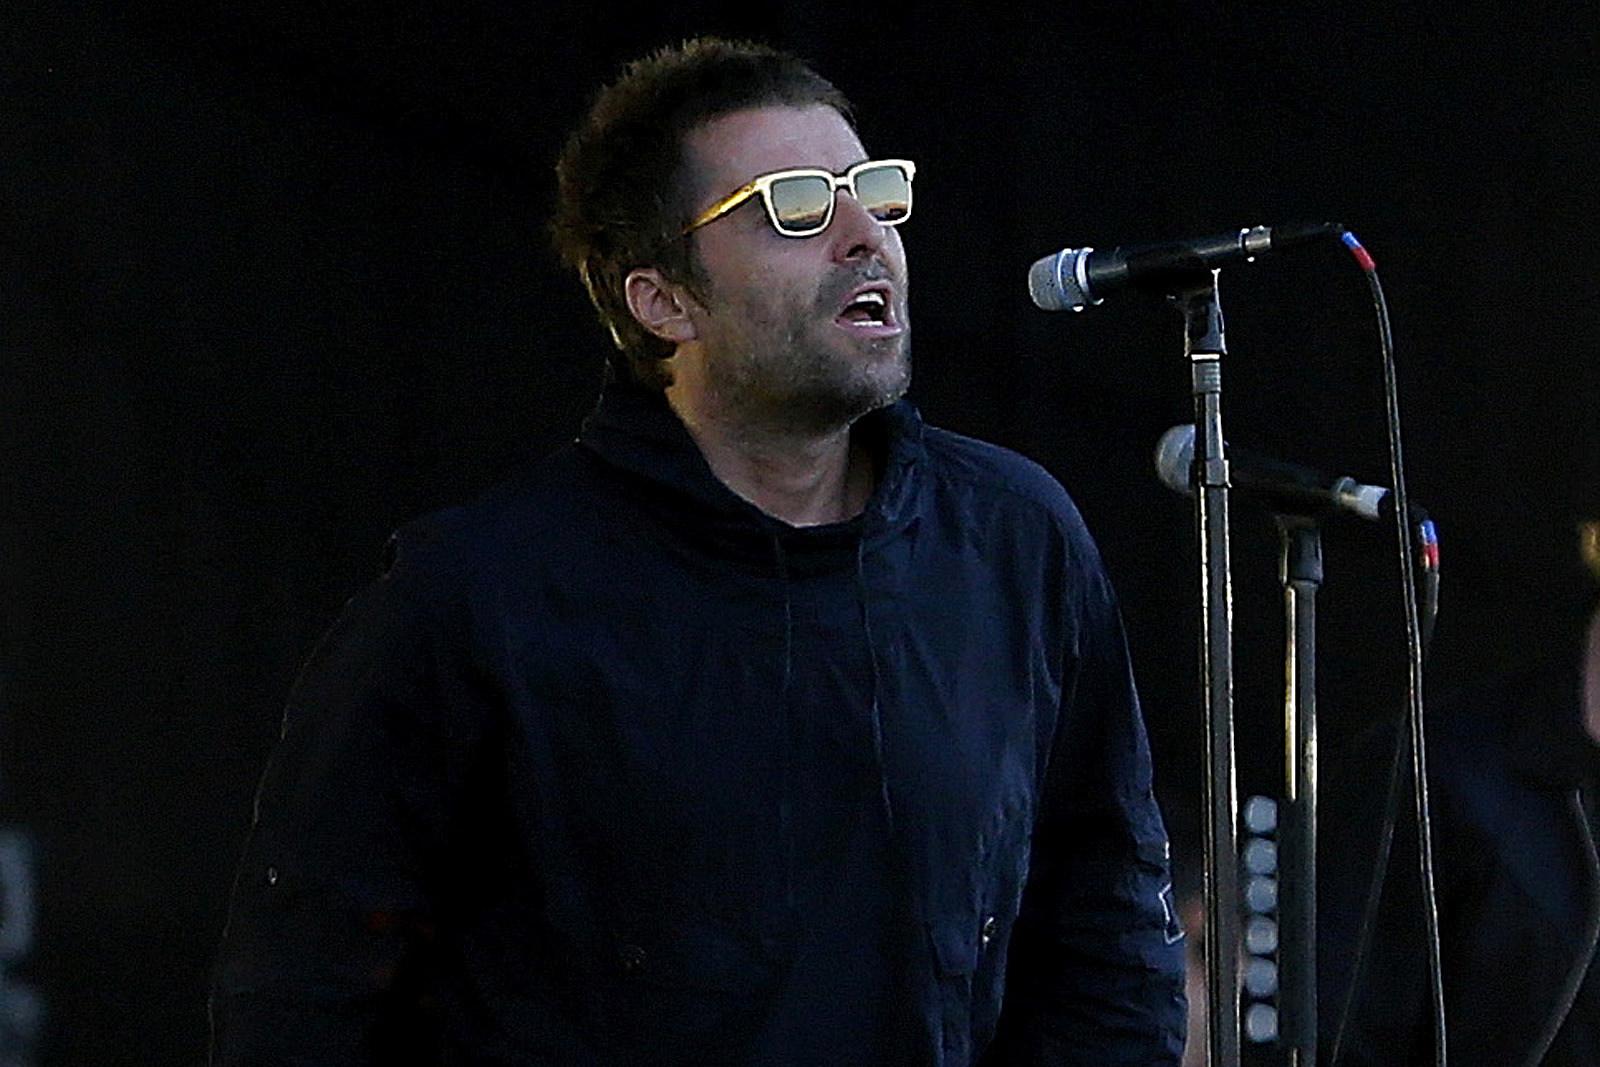 Liam Gallagher Announces 2018 North American Tour